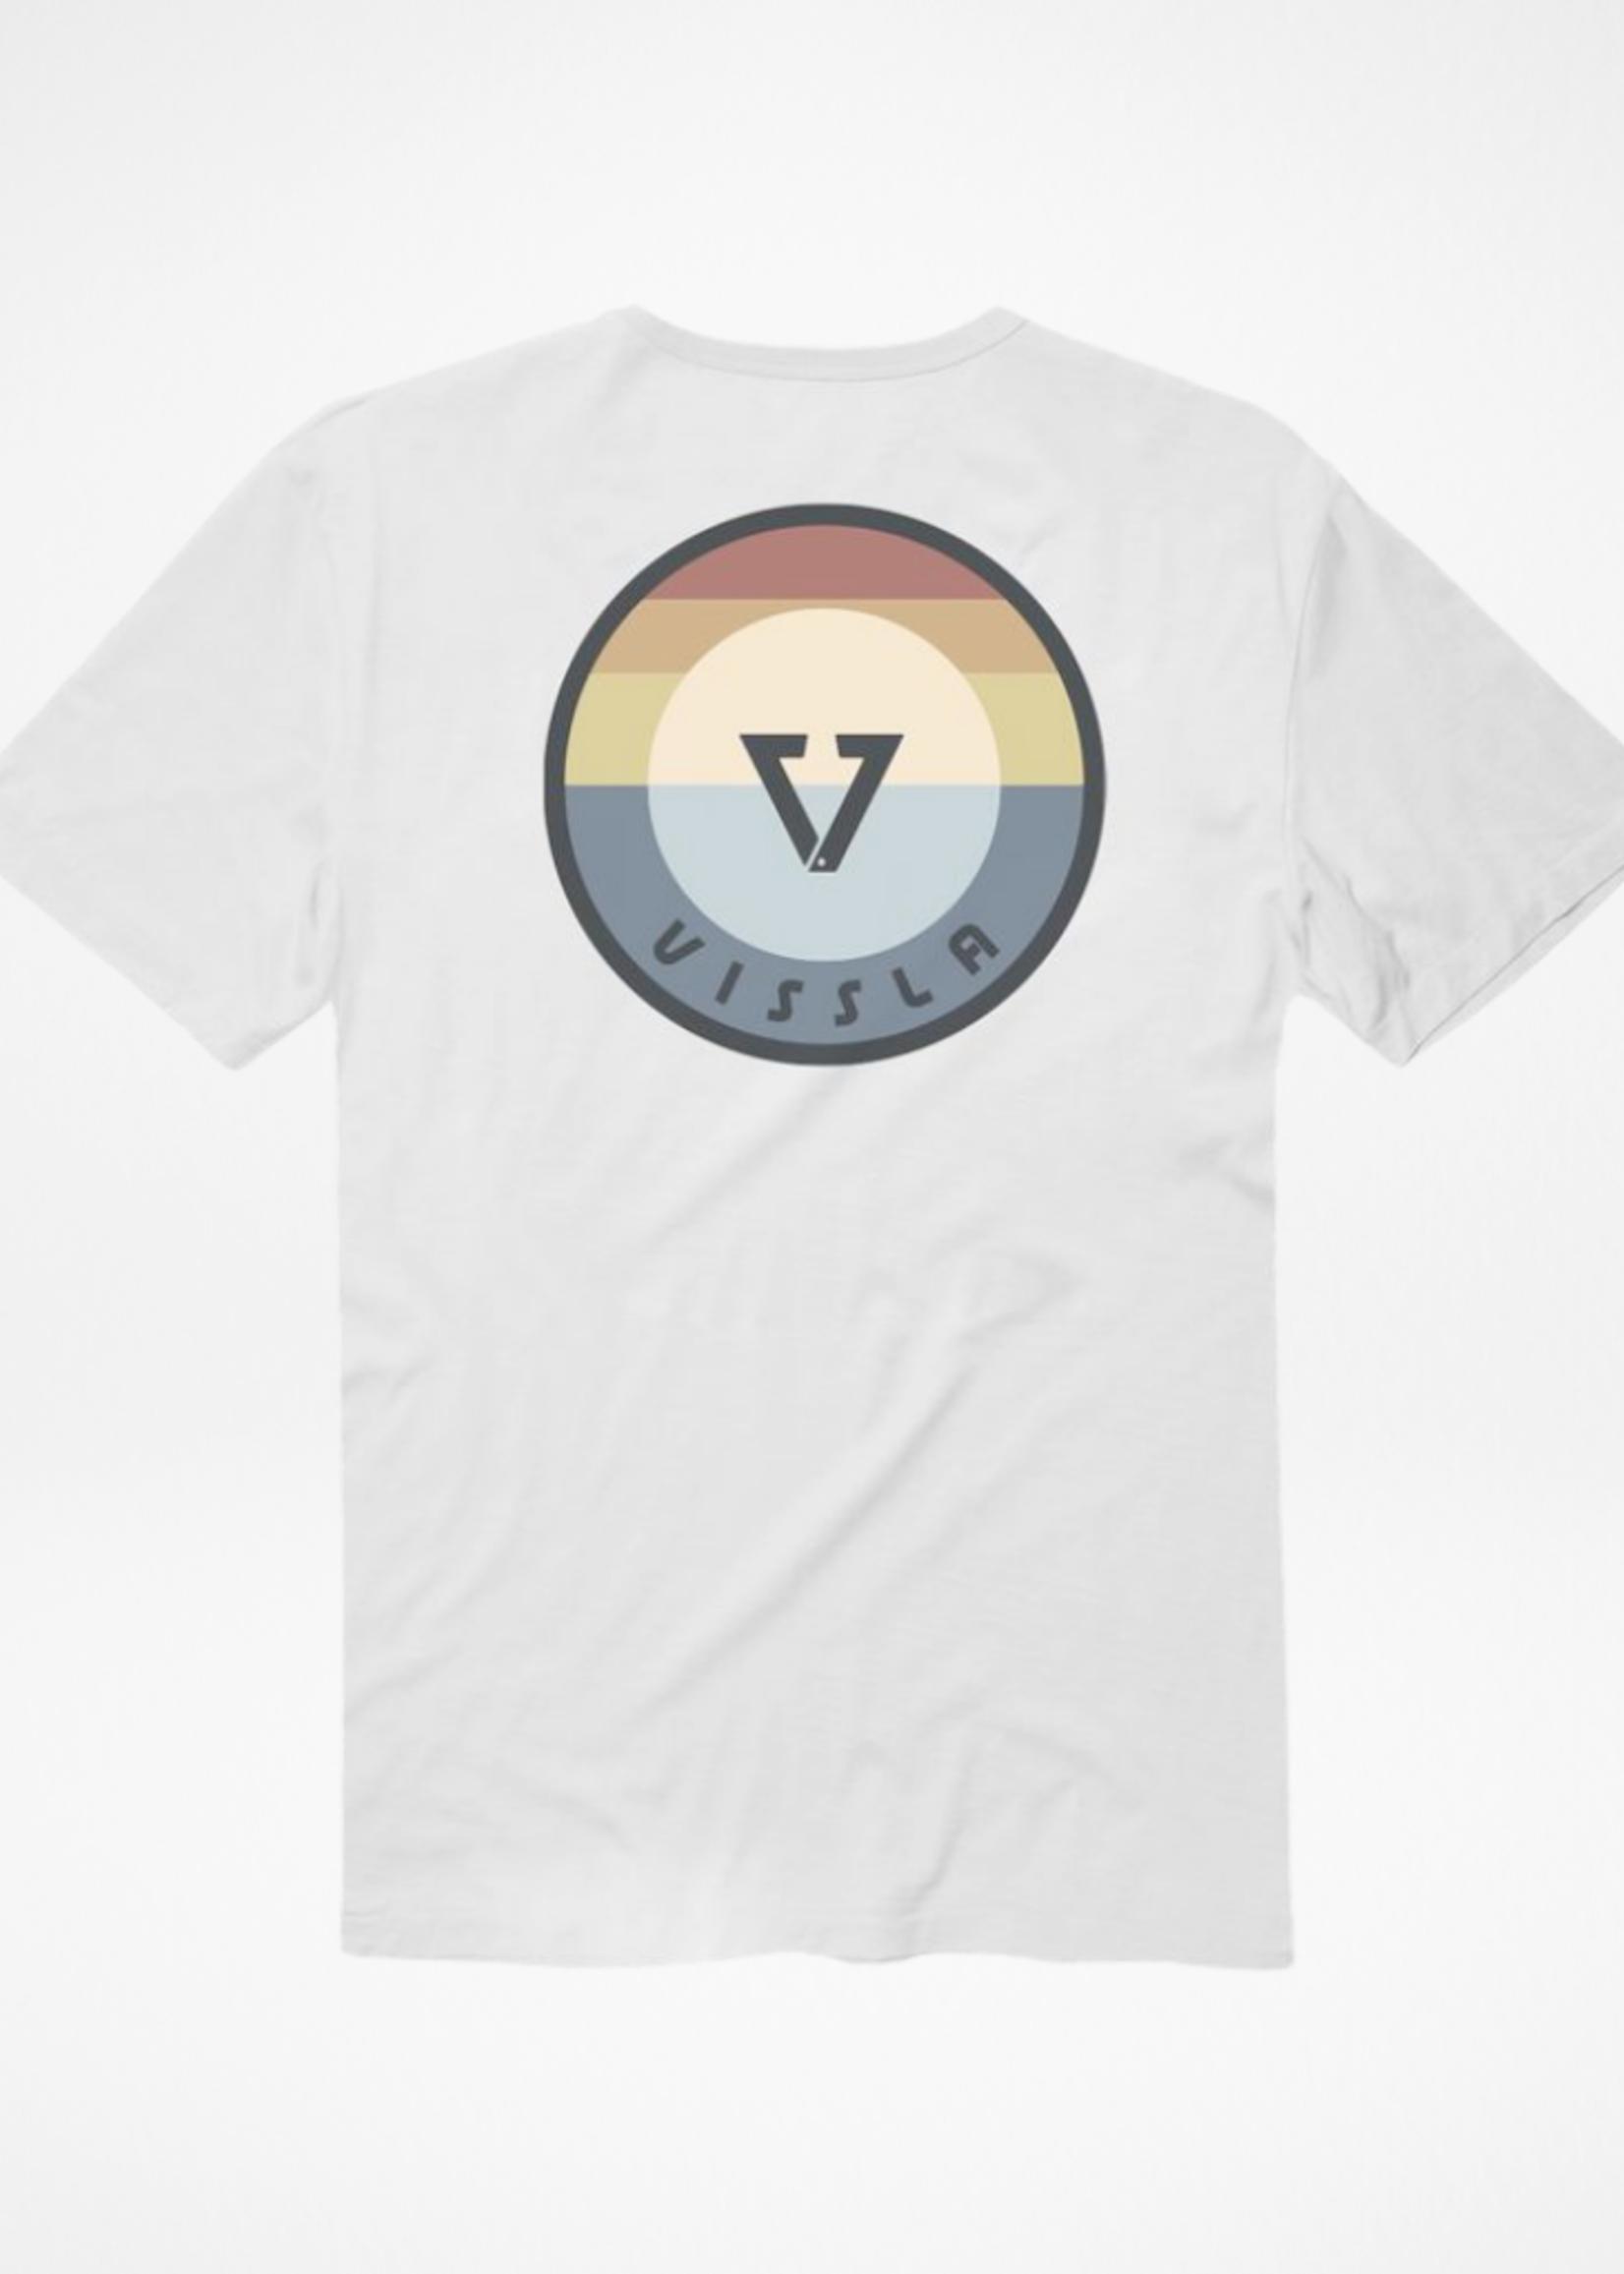 VISSLA 21 VISSLA MEDALLION WHITE TEE